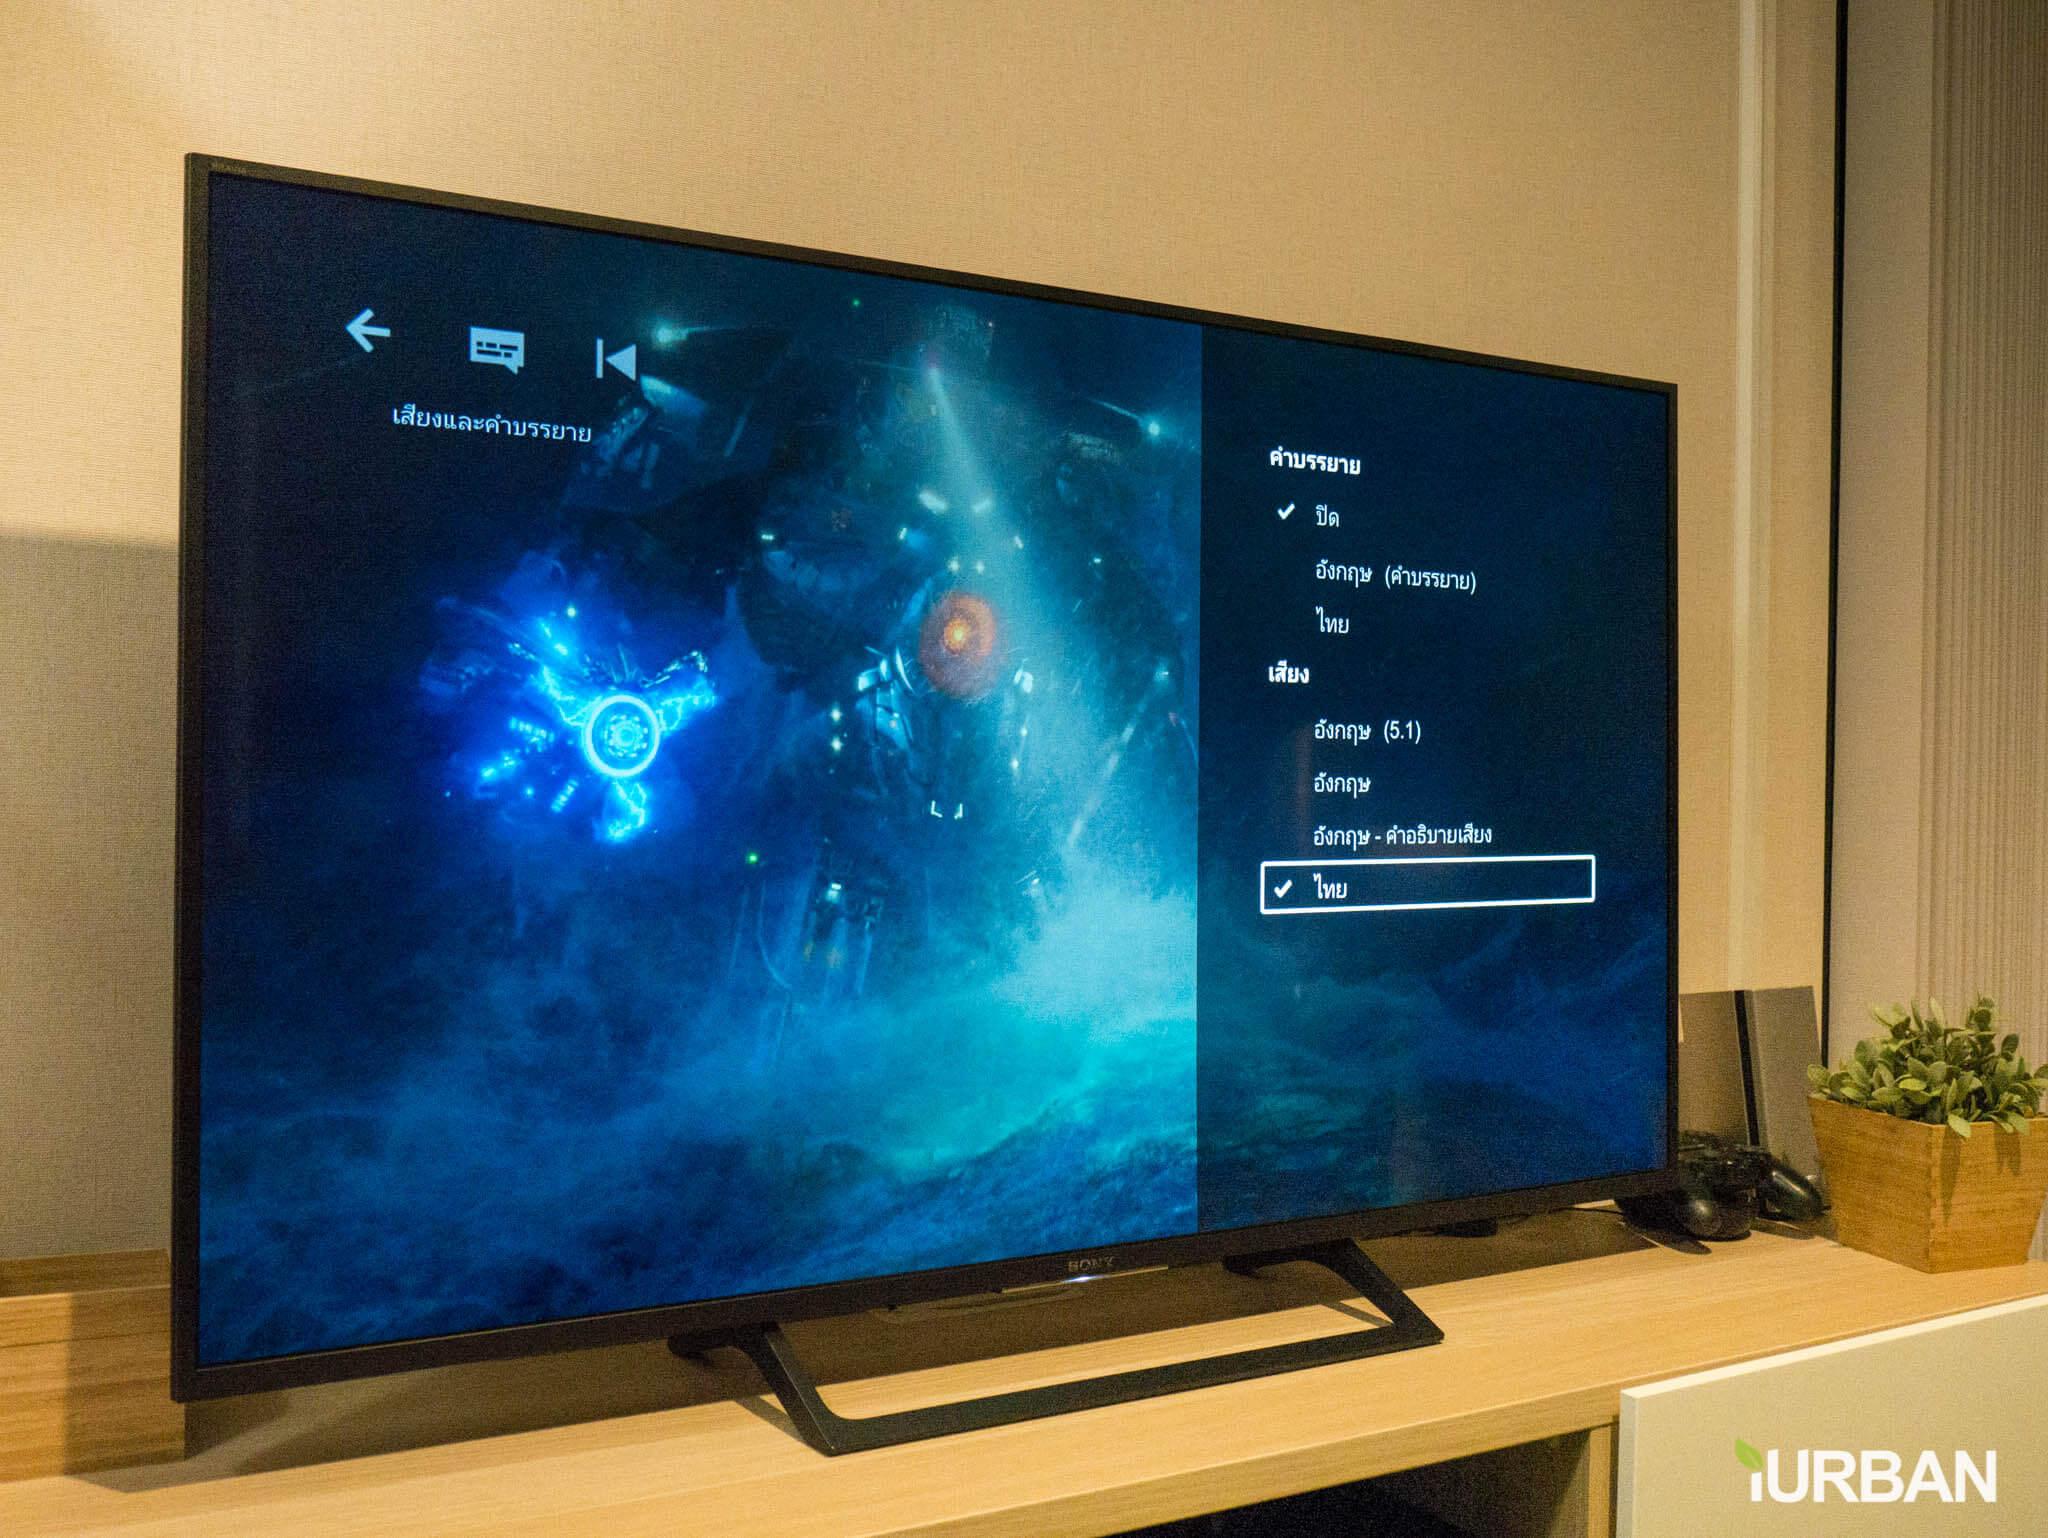 %name รีวิวภาพจริง SONY 4K HDR TV รุ่น X7000E เจน 2017 ตัวถูกสุดนี้ มีดีอะไรบ้าง?